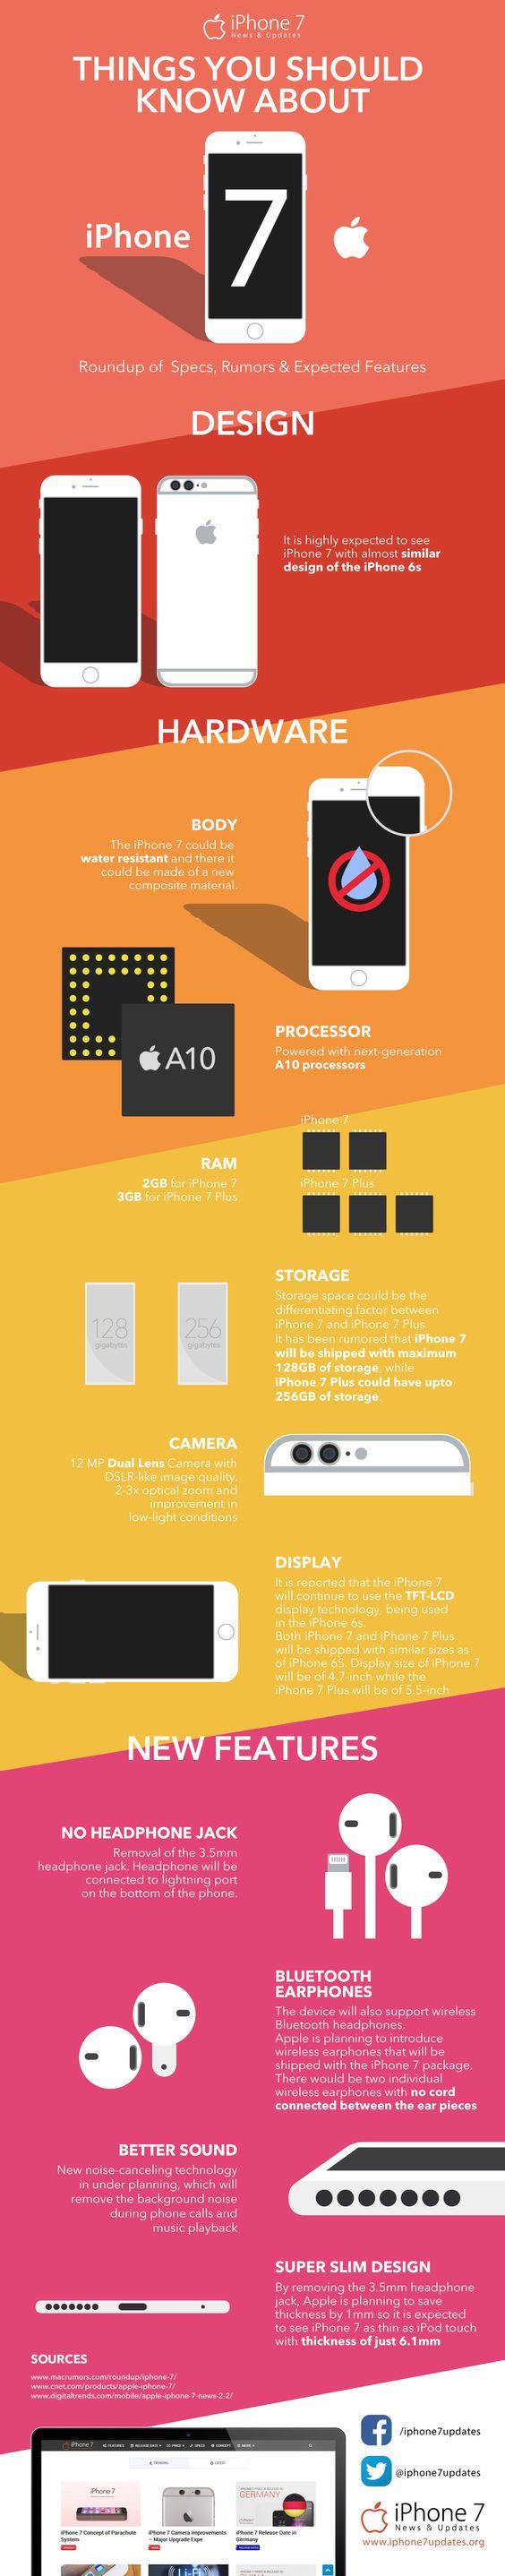 iPhone 7-Specs-Rumors- Features-Infographic